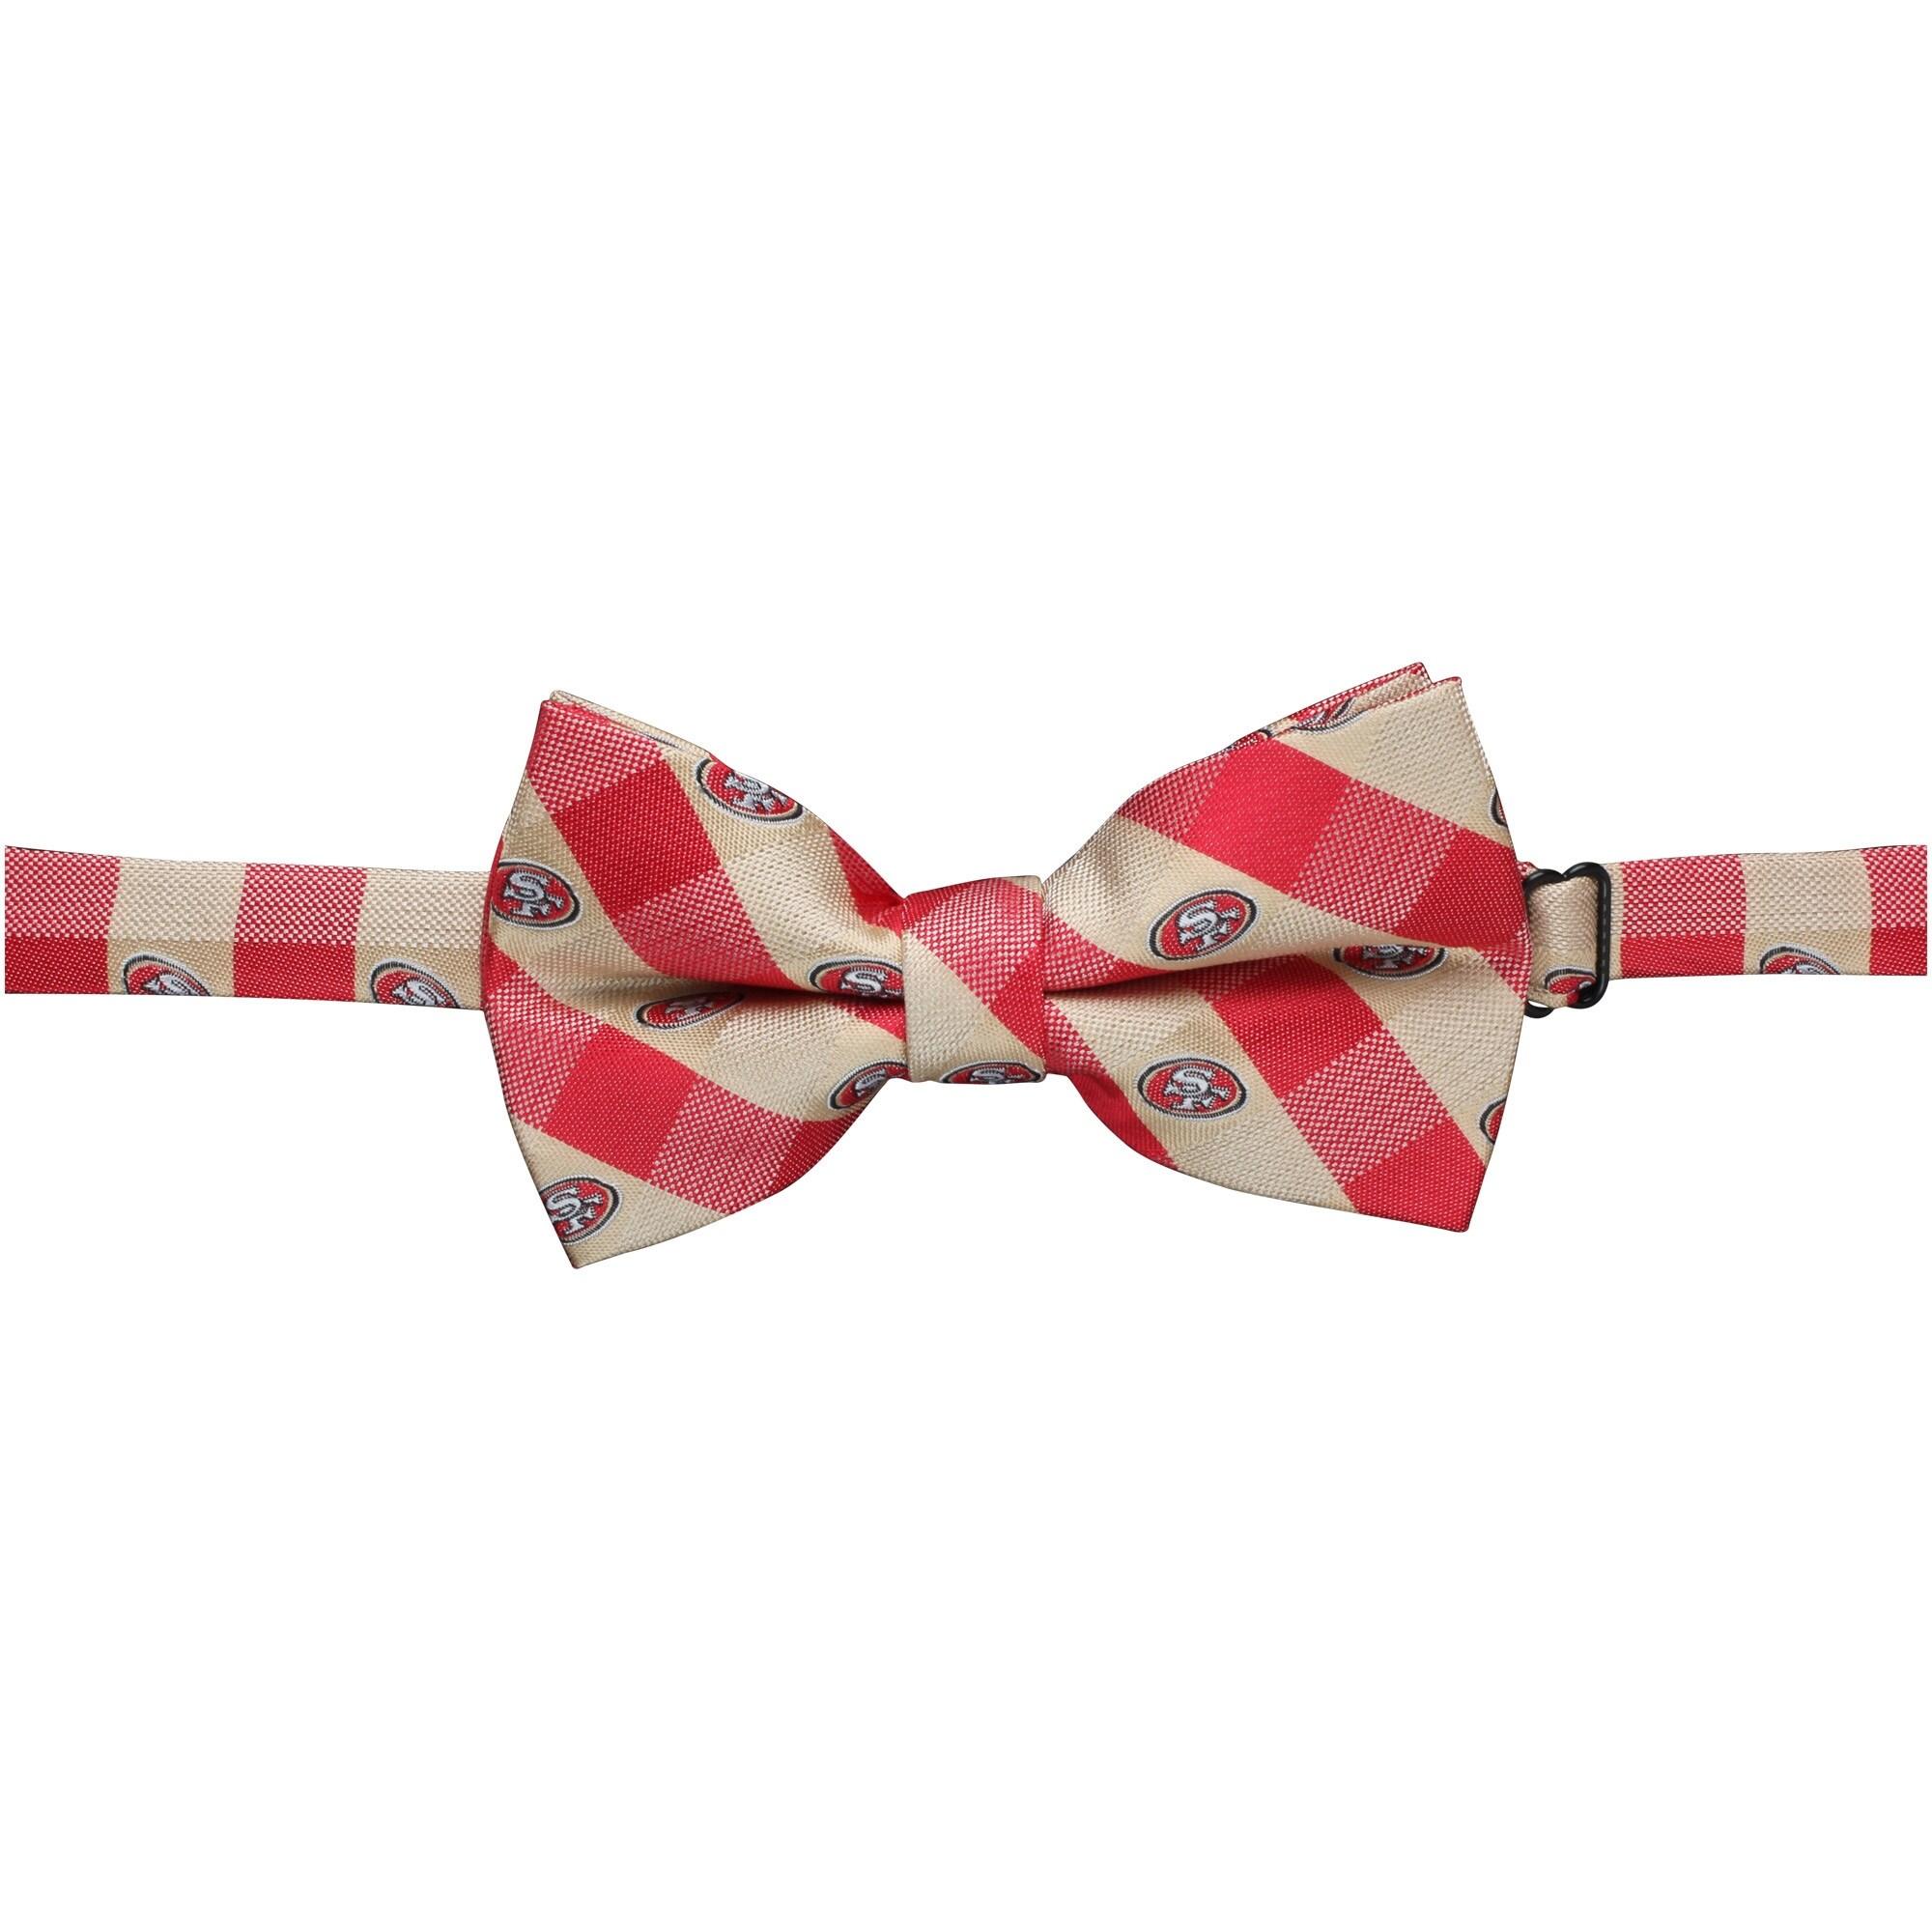 San Francisco 49ers Check Bow Tie